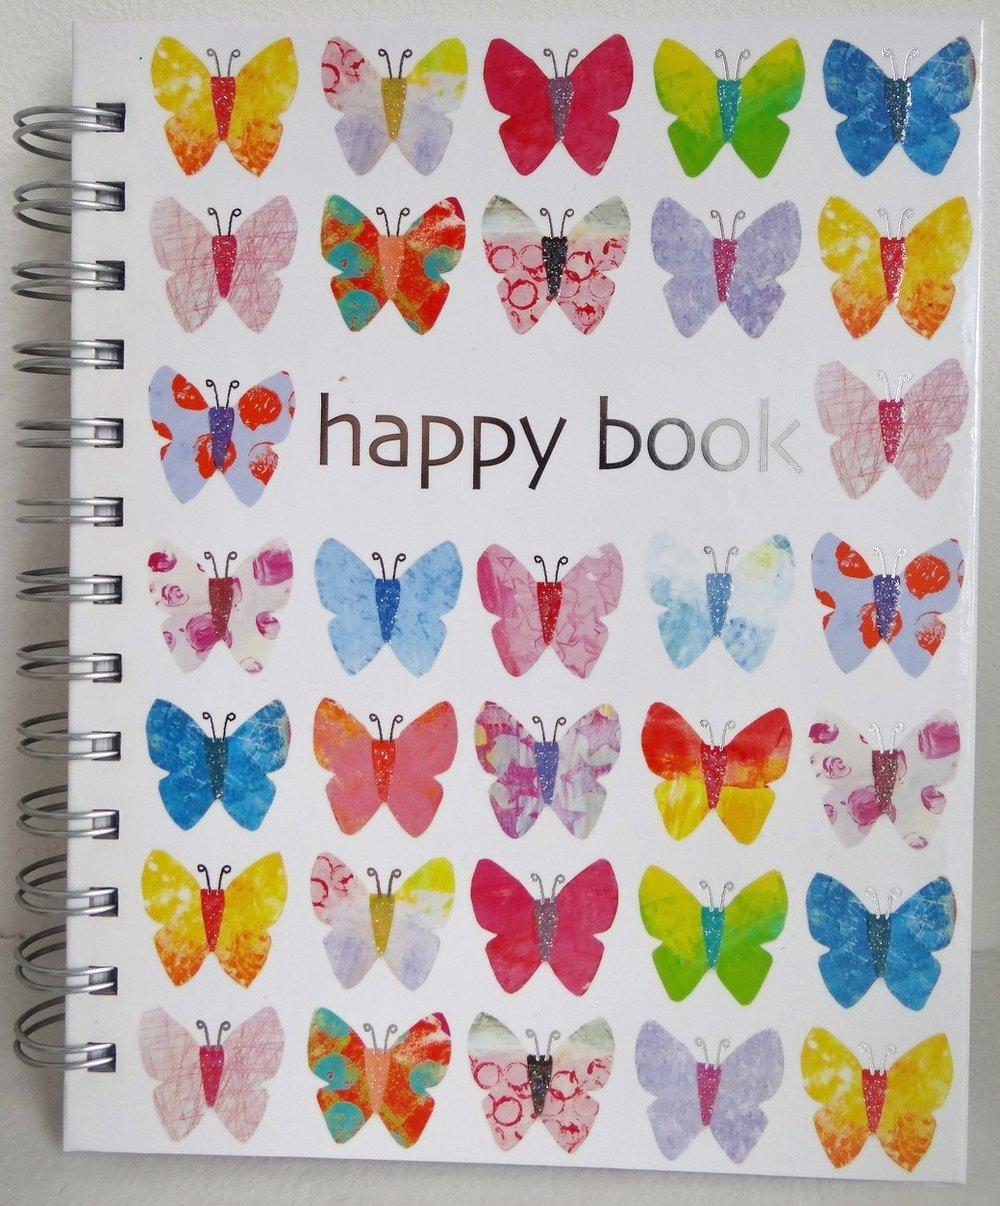 happy book.jpg